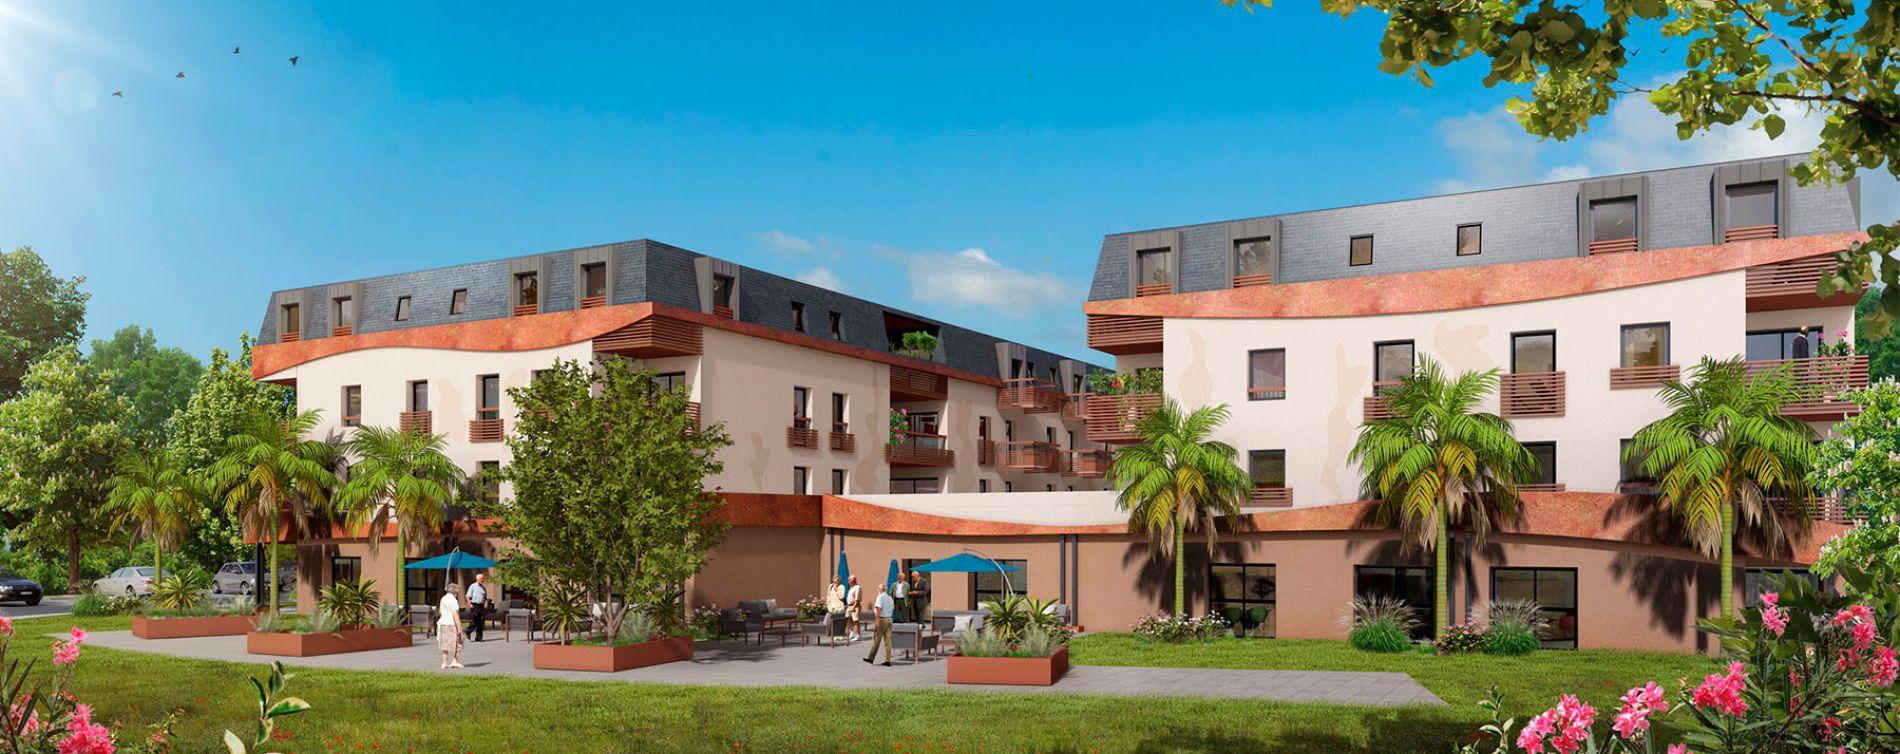 Tarbes : programme immobilier neuve « Oh! Activ' »